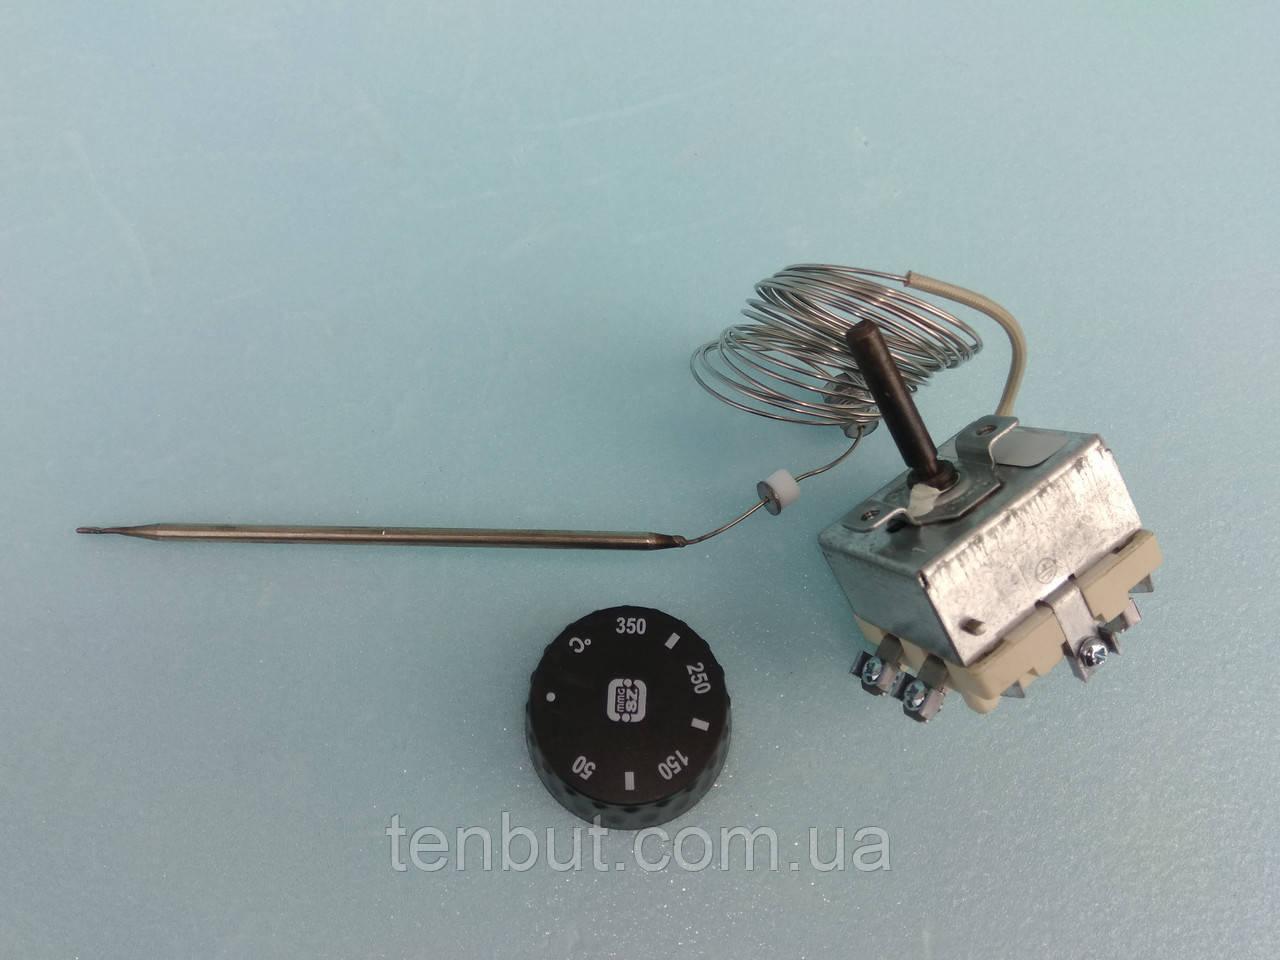 Терморегулятор MMG - 350 ℃ / 250 В. / 2-х полюсный аналог Т-32М  капилярный 2.2 м. производство Венгрия